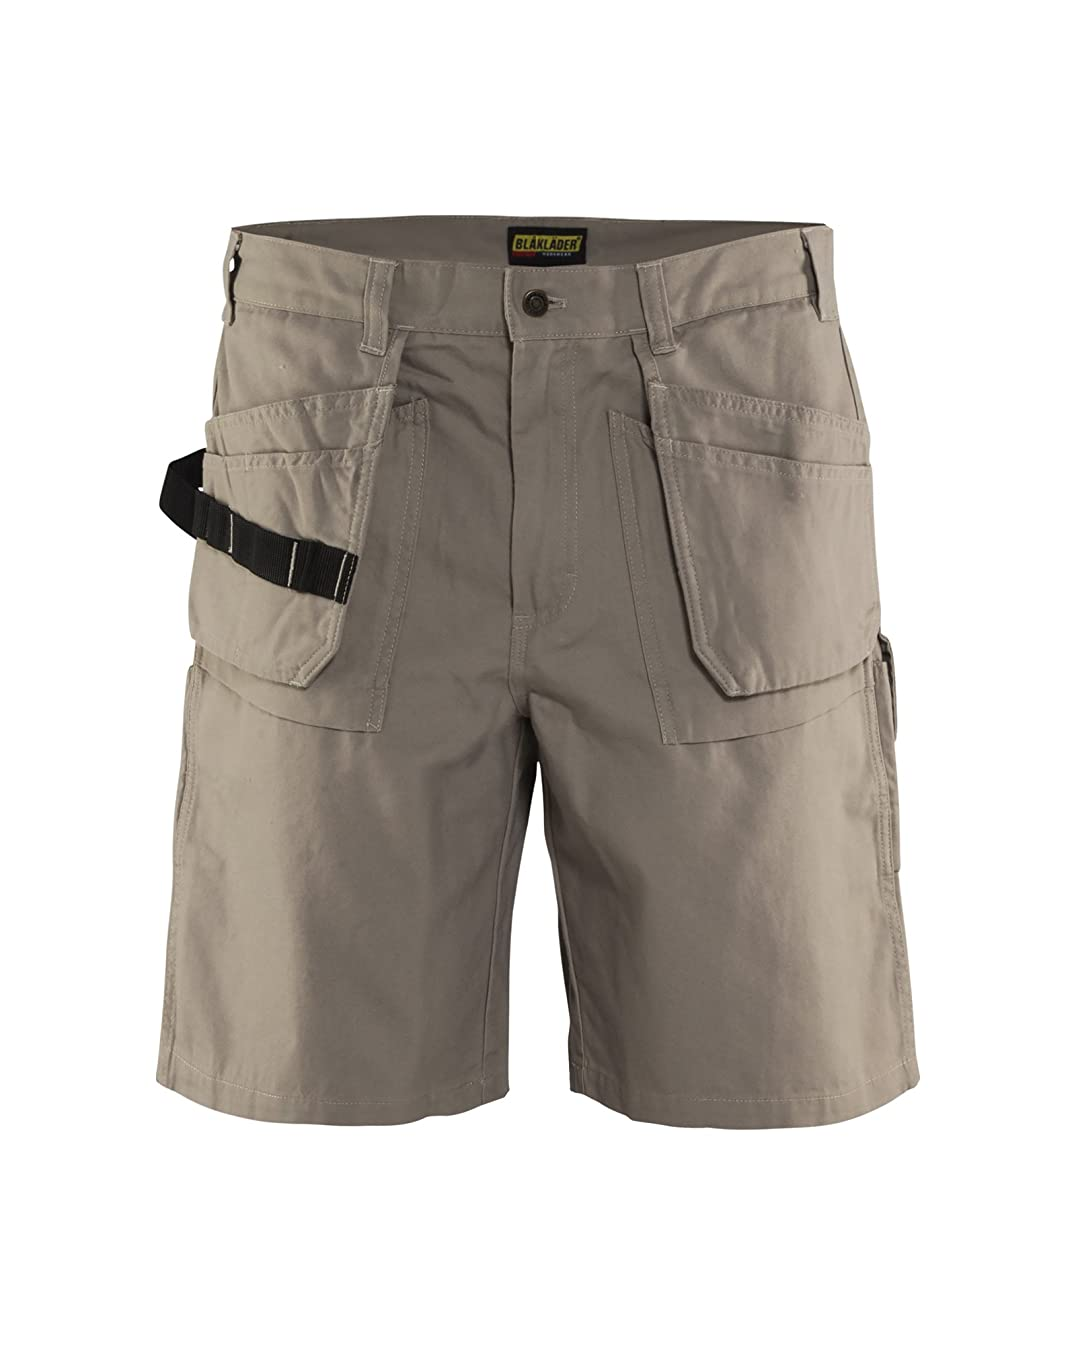 Blaklader Bantam Work Shorts (Men's Size 36, Stone)